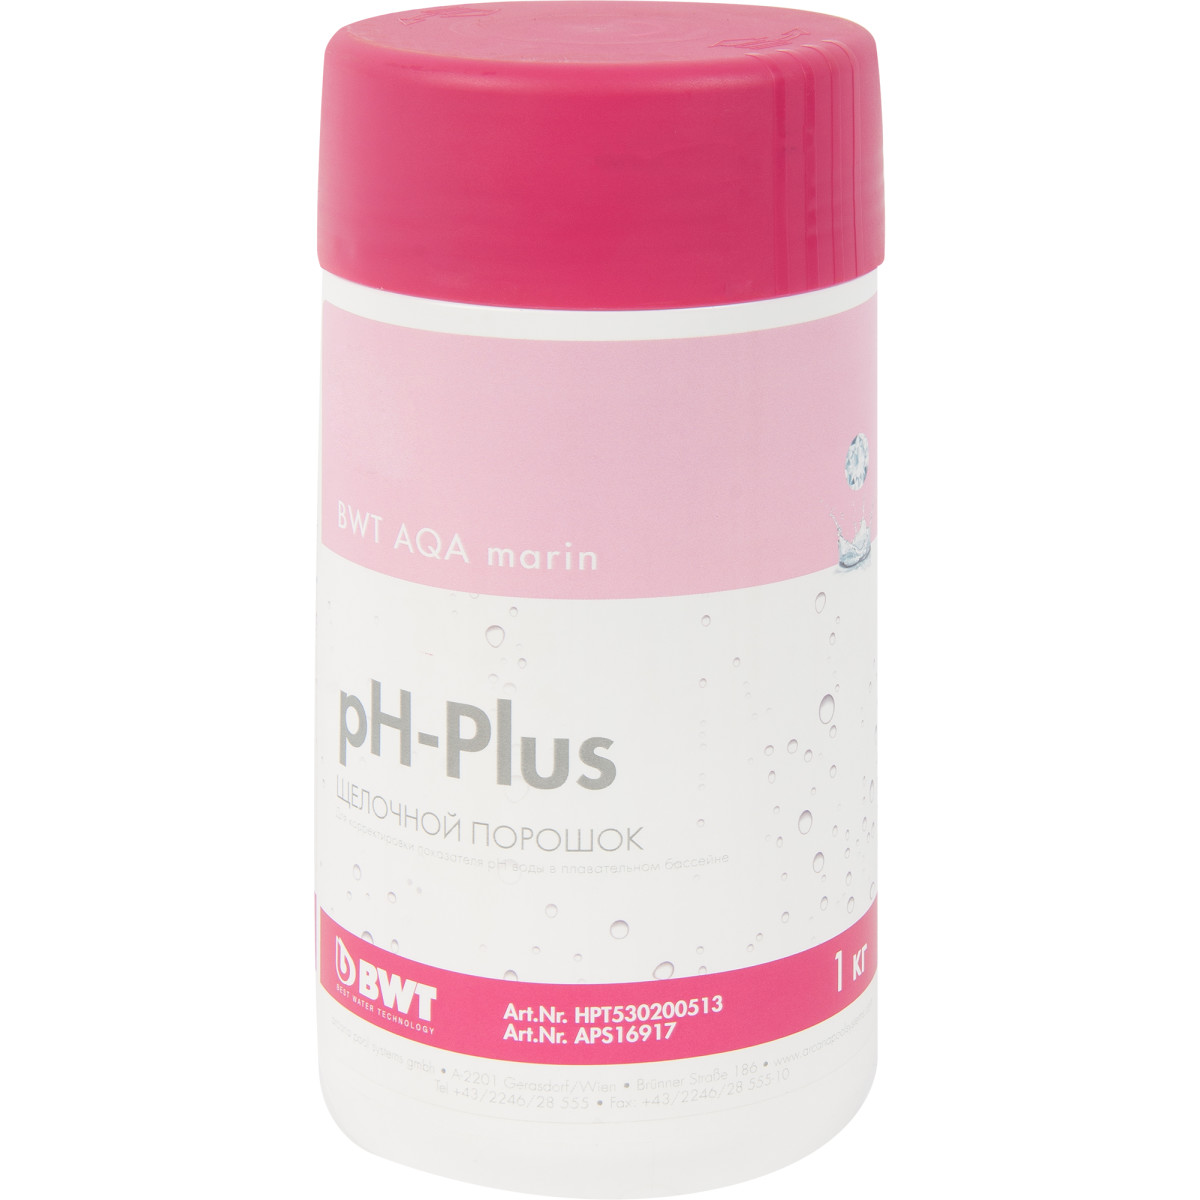 Щелочный порошок BWT AQA marin pH Plus 1кг